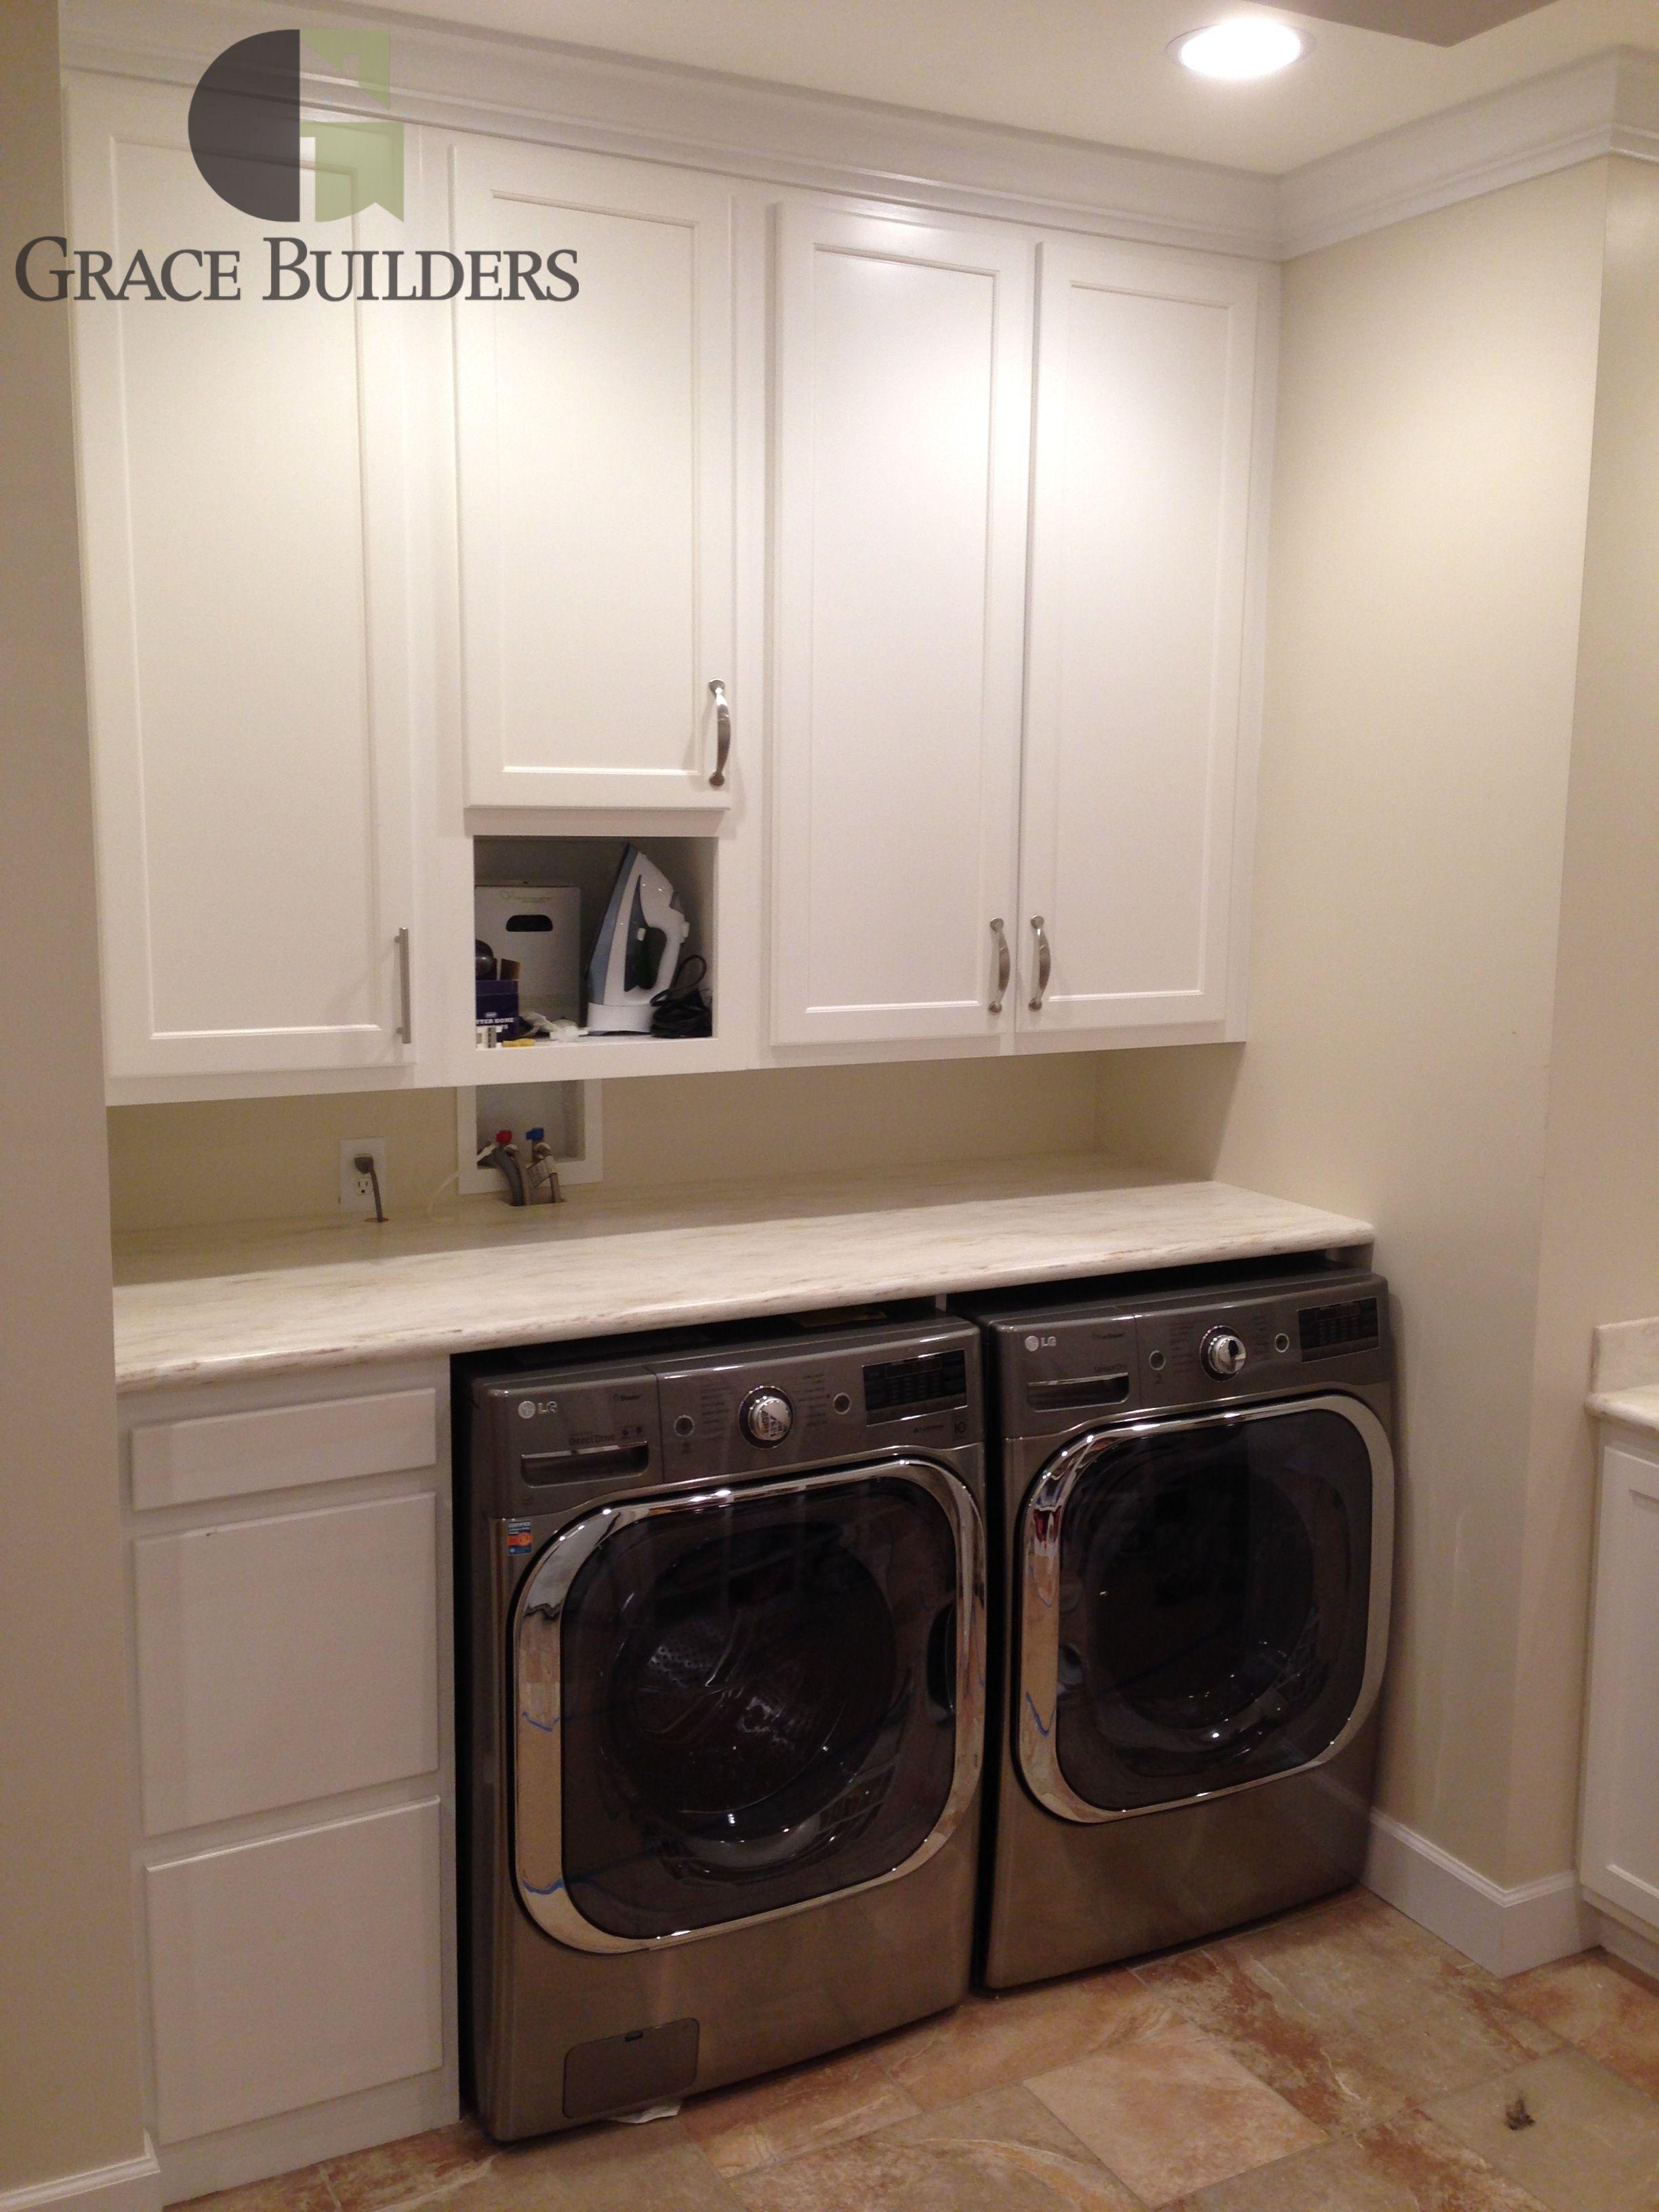 Grace Builders laundry room appliances washing machine washer